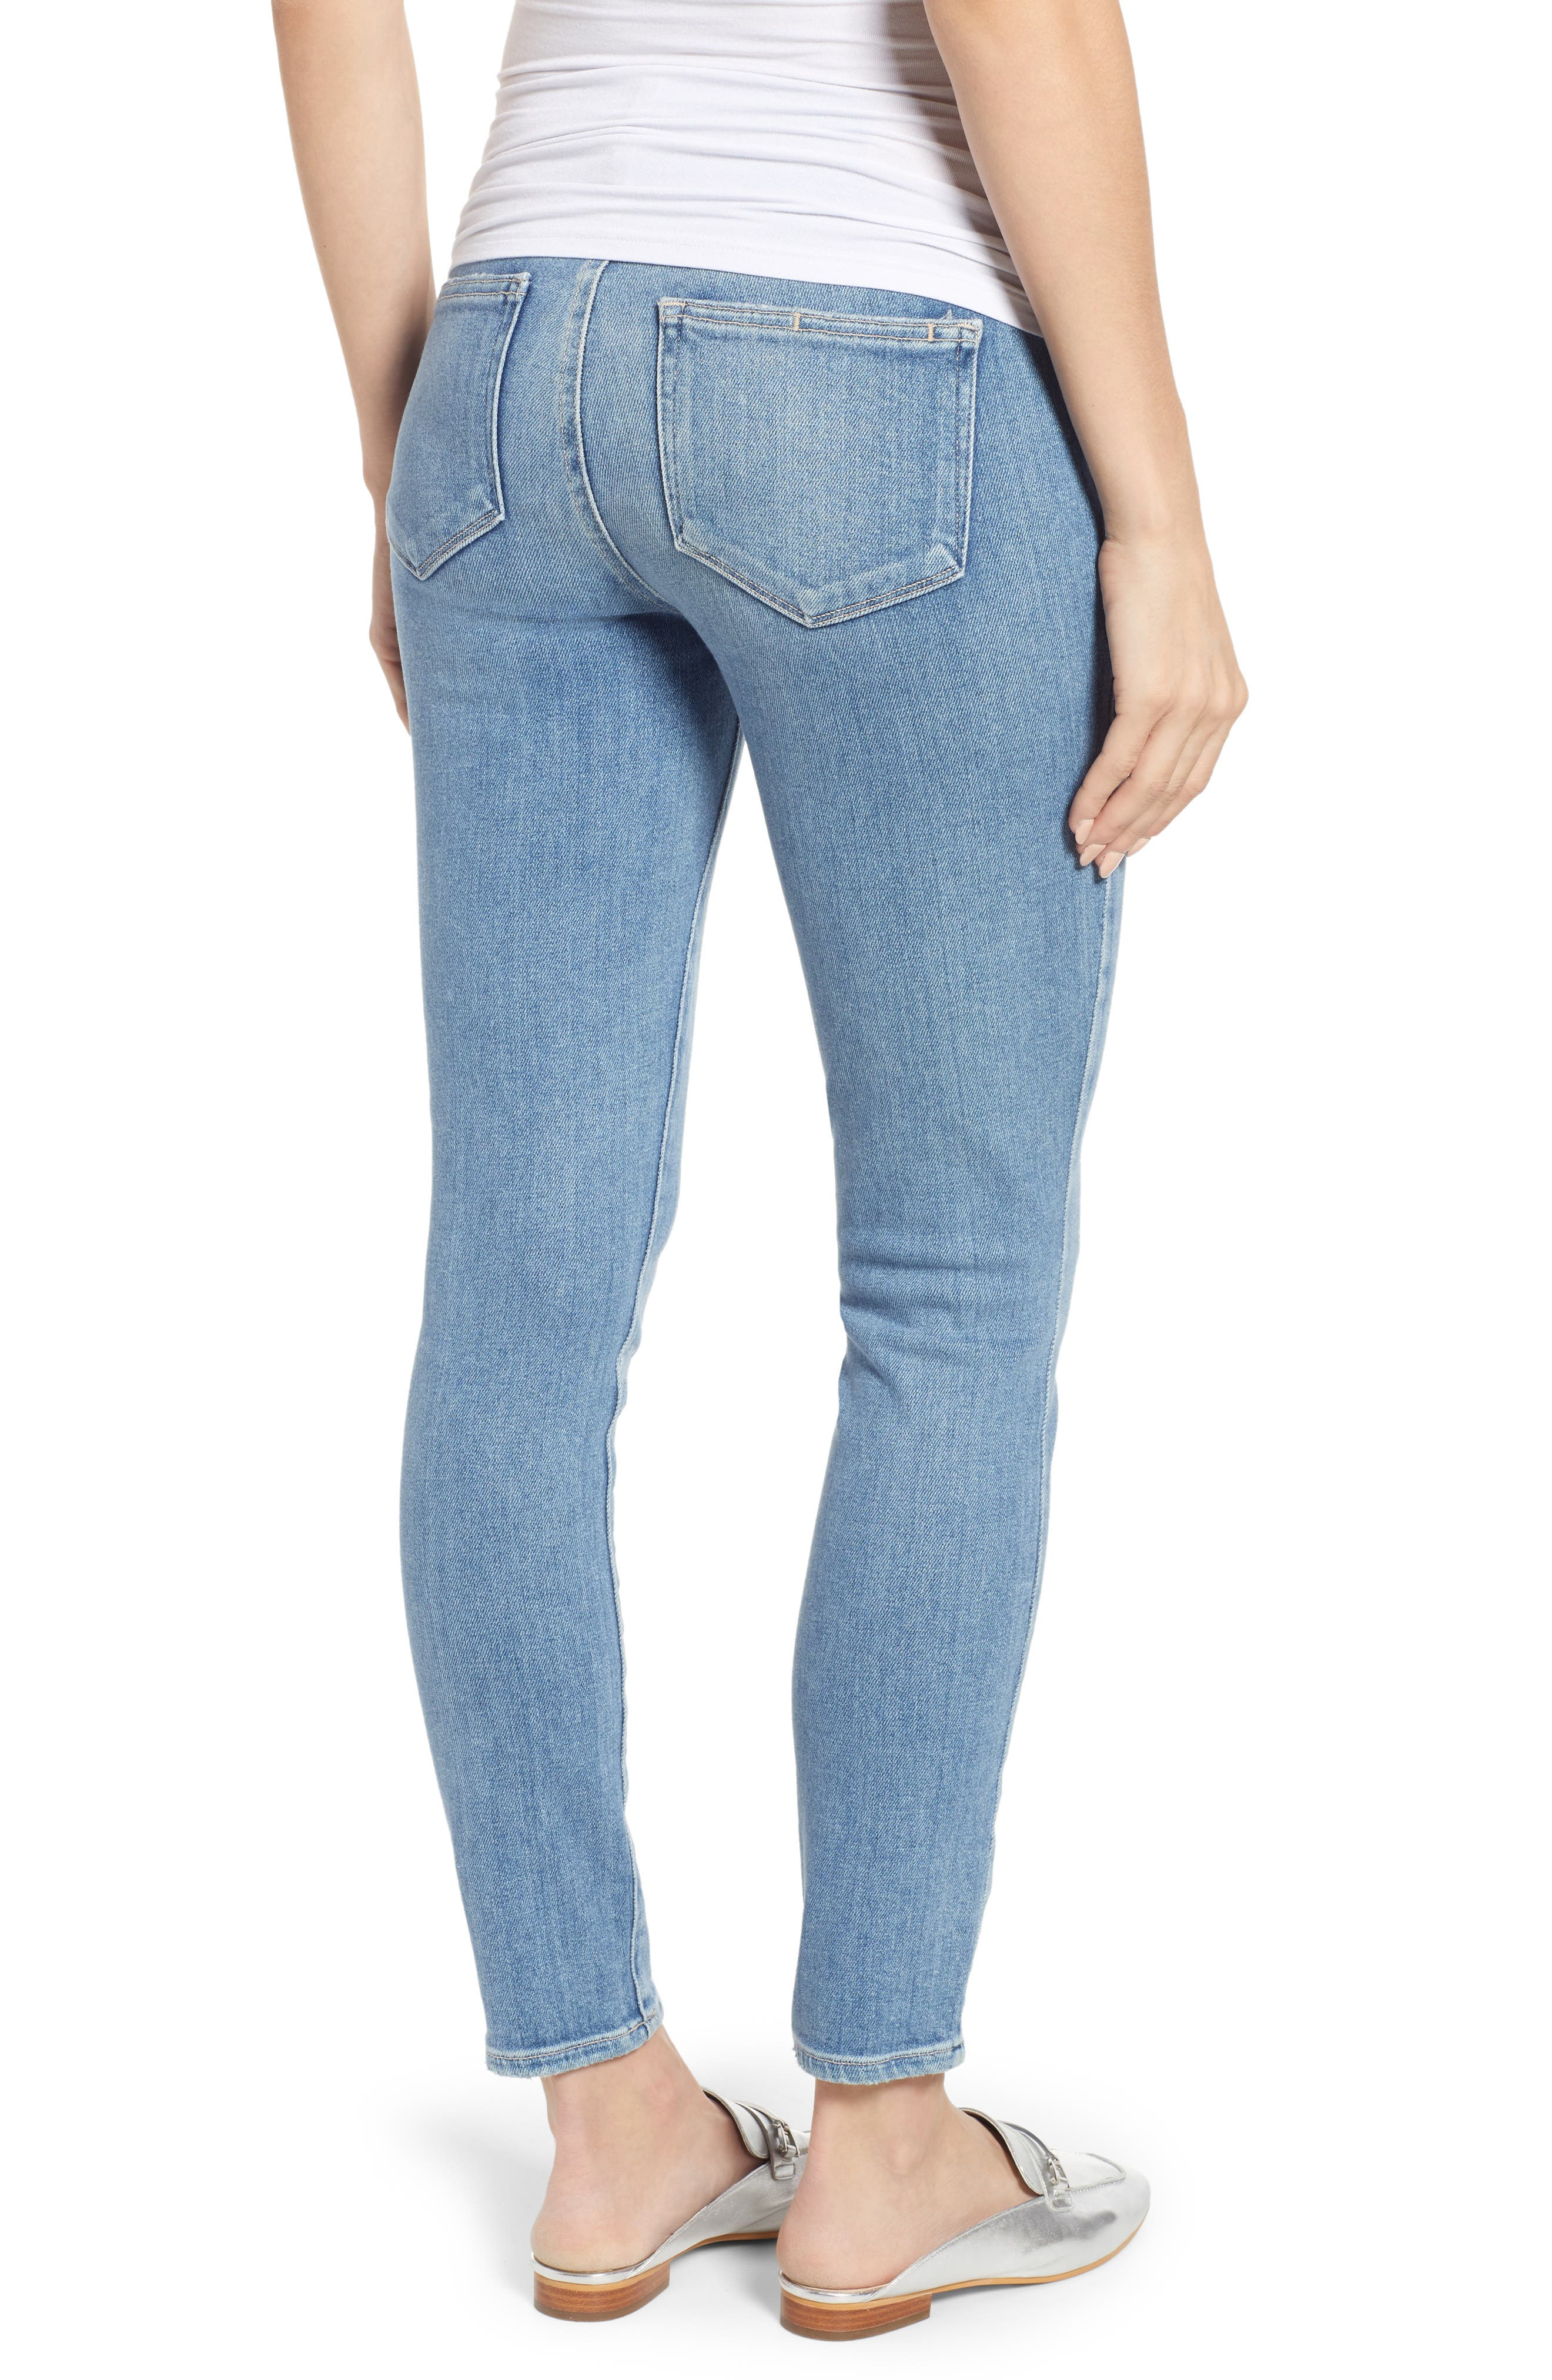 Verdugo Distressed Ankle Skinny Maternity Jeans,                             Alternate thumbnail 2, color,                             KAYSAN DISTRESSED